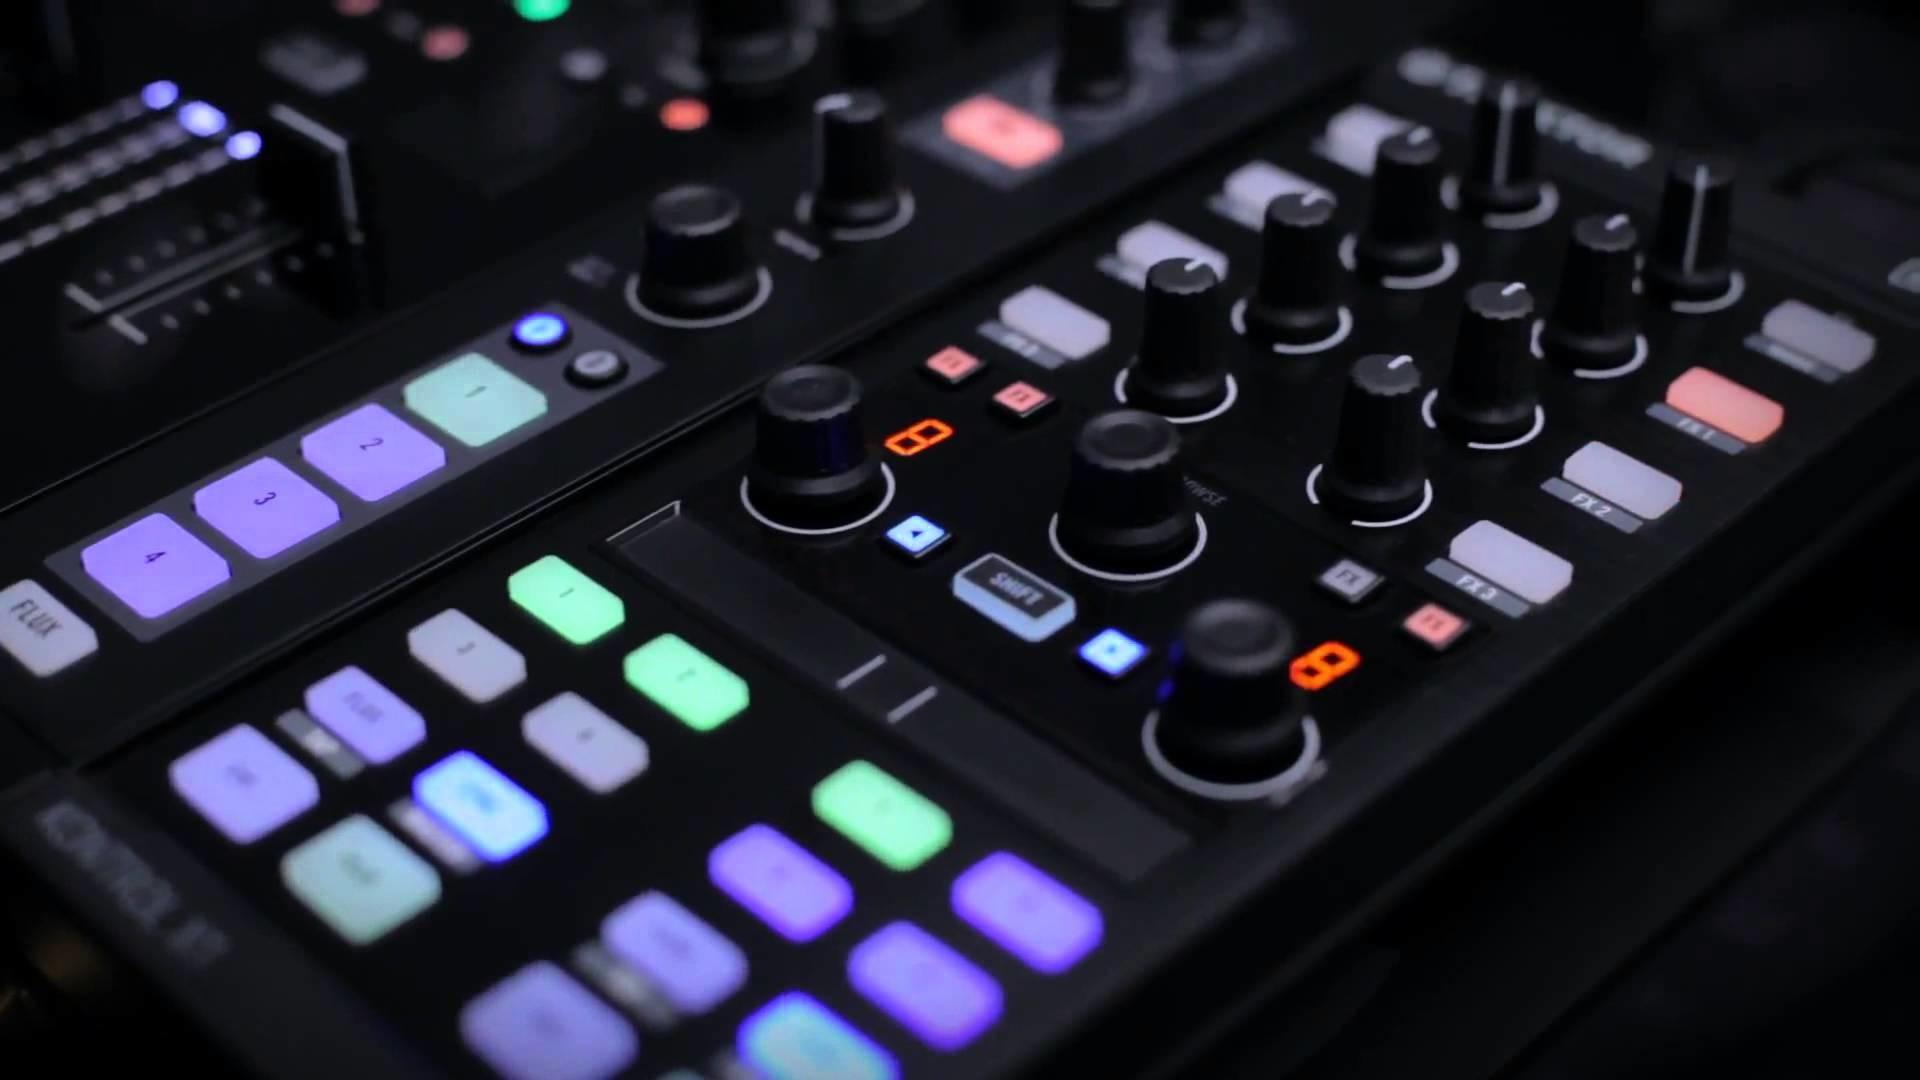 DJ equipment and DJ accessories at Juno